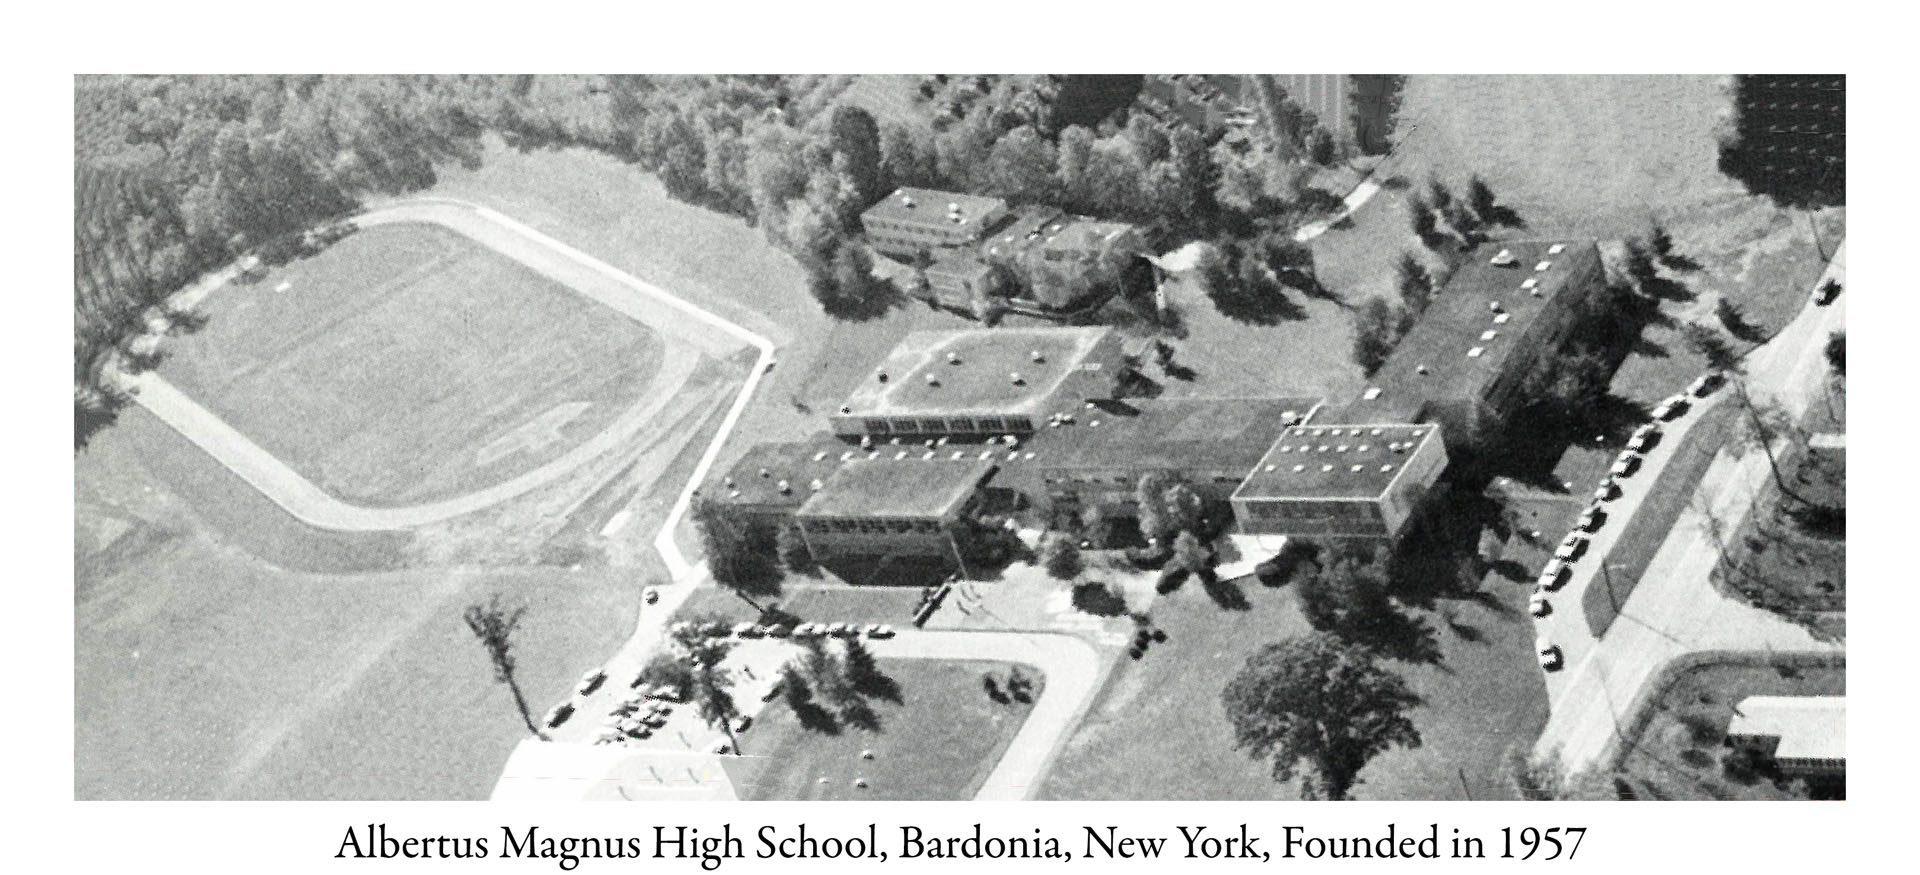 1957 – Albertus Magnus High School, Bardonia, NY